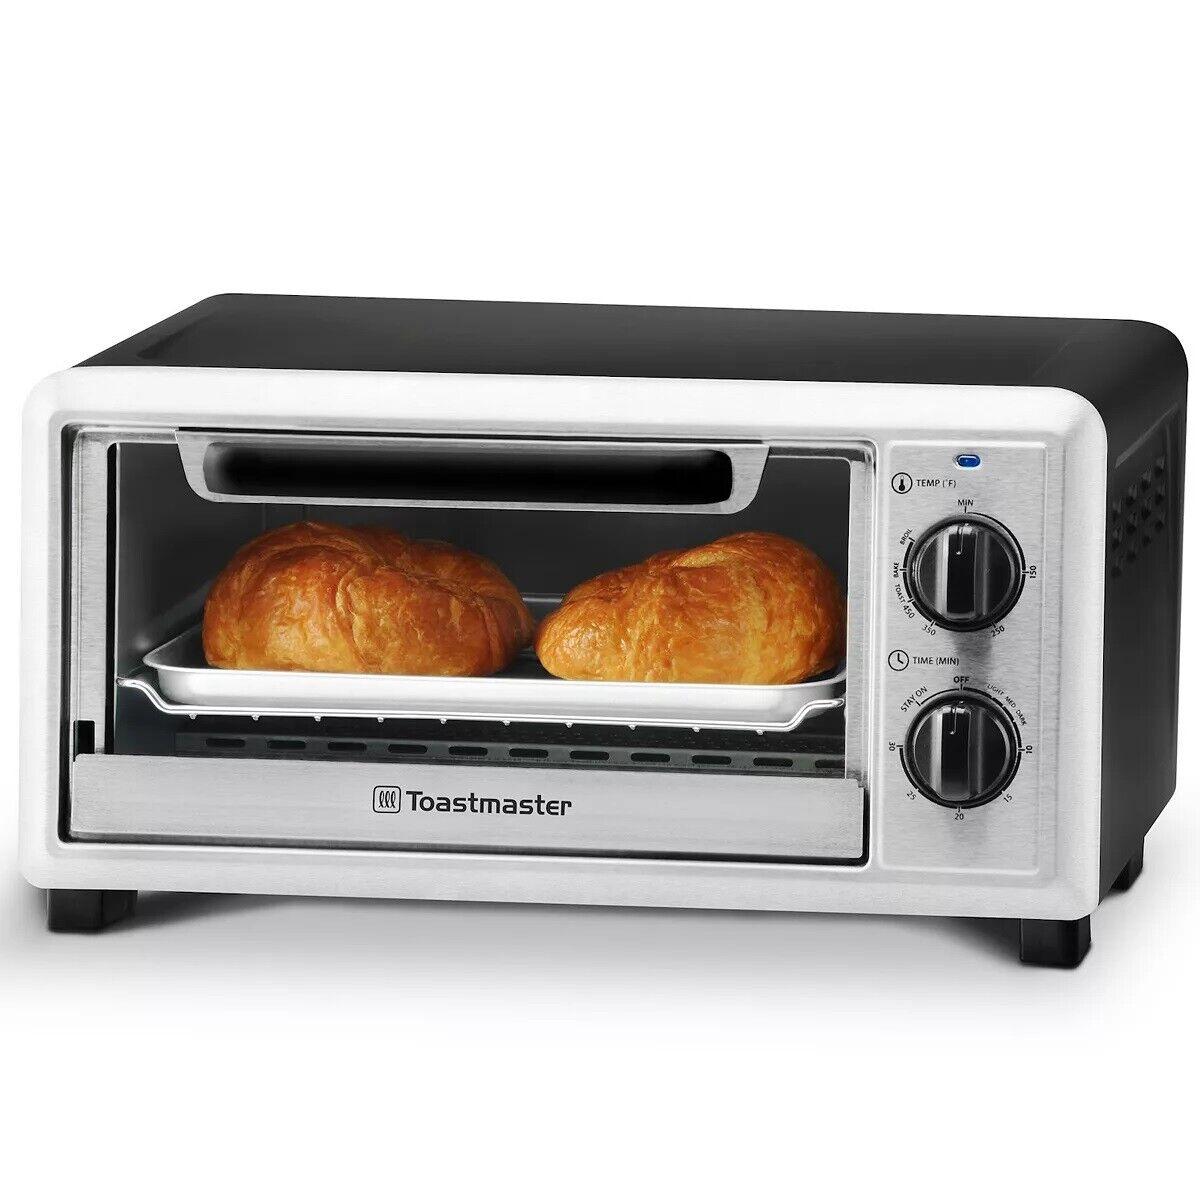 Toastmaster 4-Slice 10 Liter Toaster Oven 1000Watts Temperature Control TM-104TR